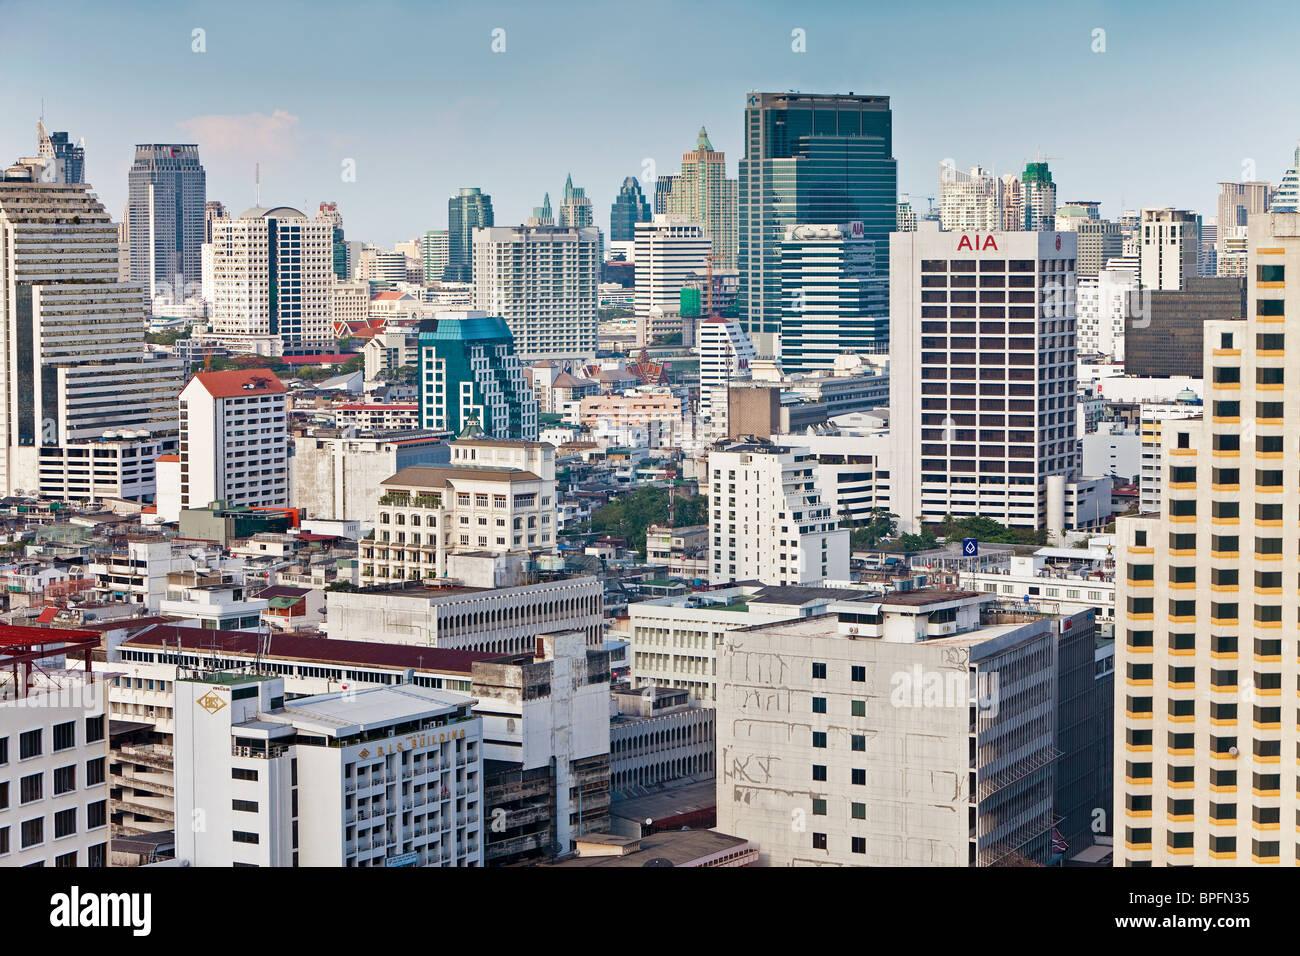 Modern City Skyline looking towards the Sukhumvit district, Bangkok, Thailand, Southeast Asia - Stock Image